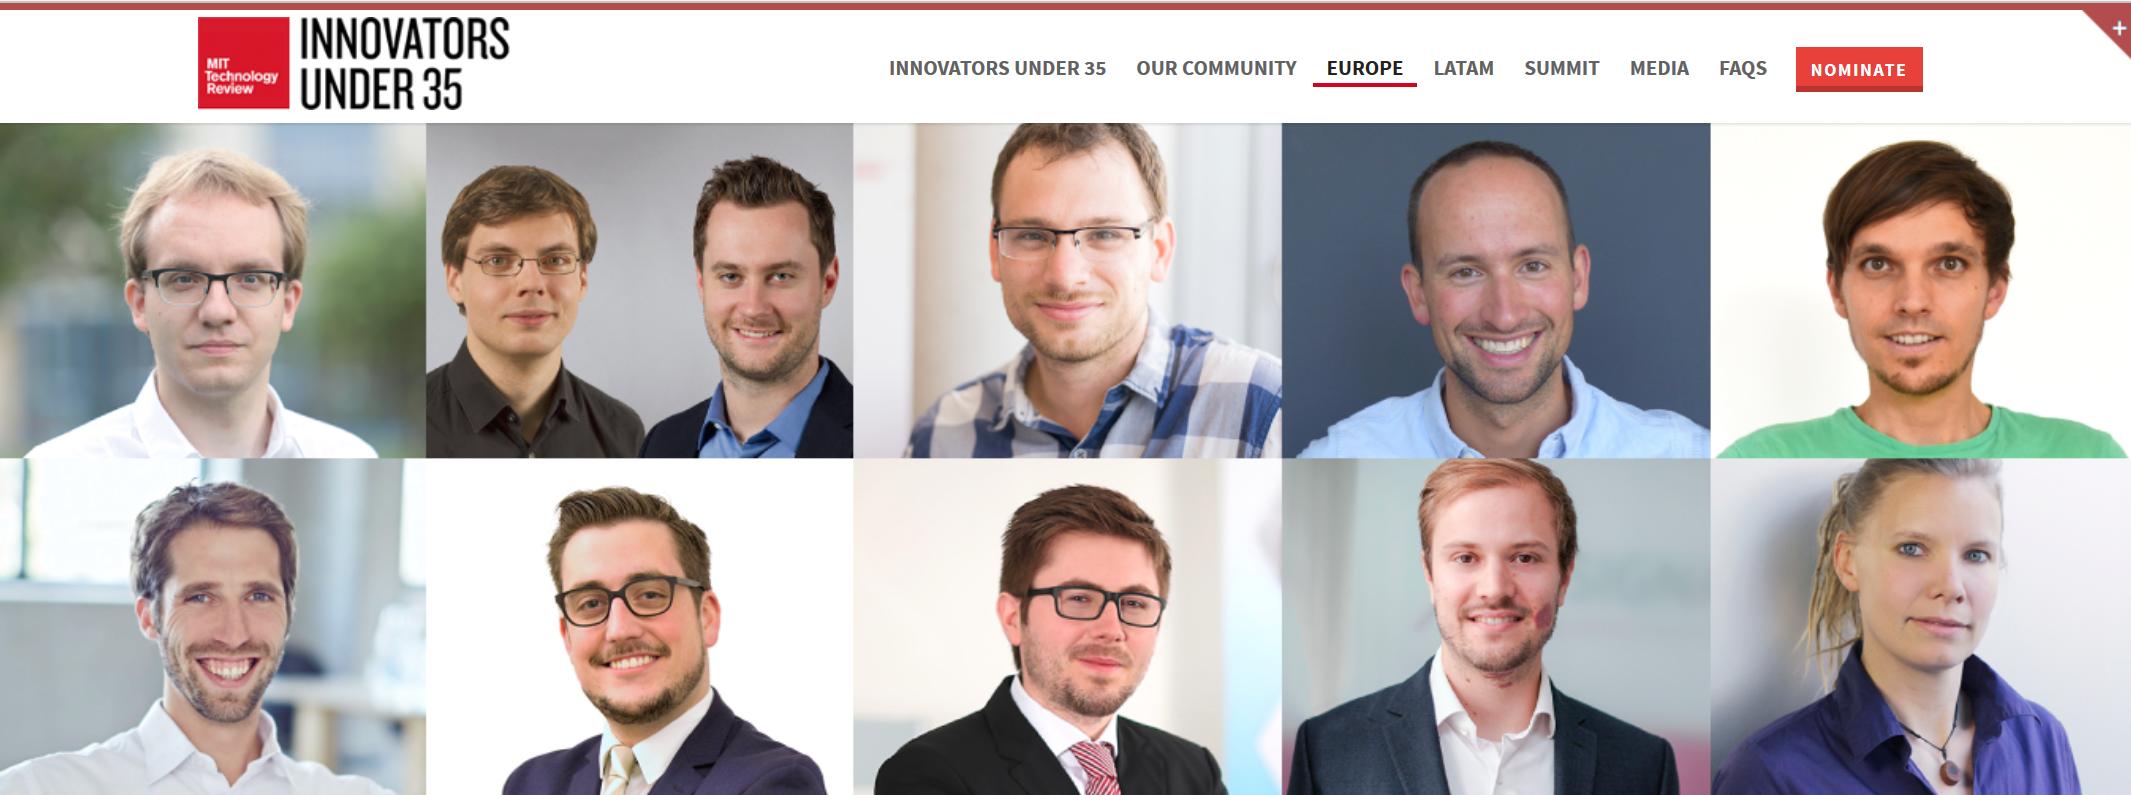 MIT Technology Review Innovators under 35